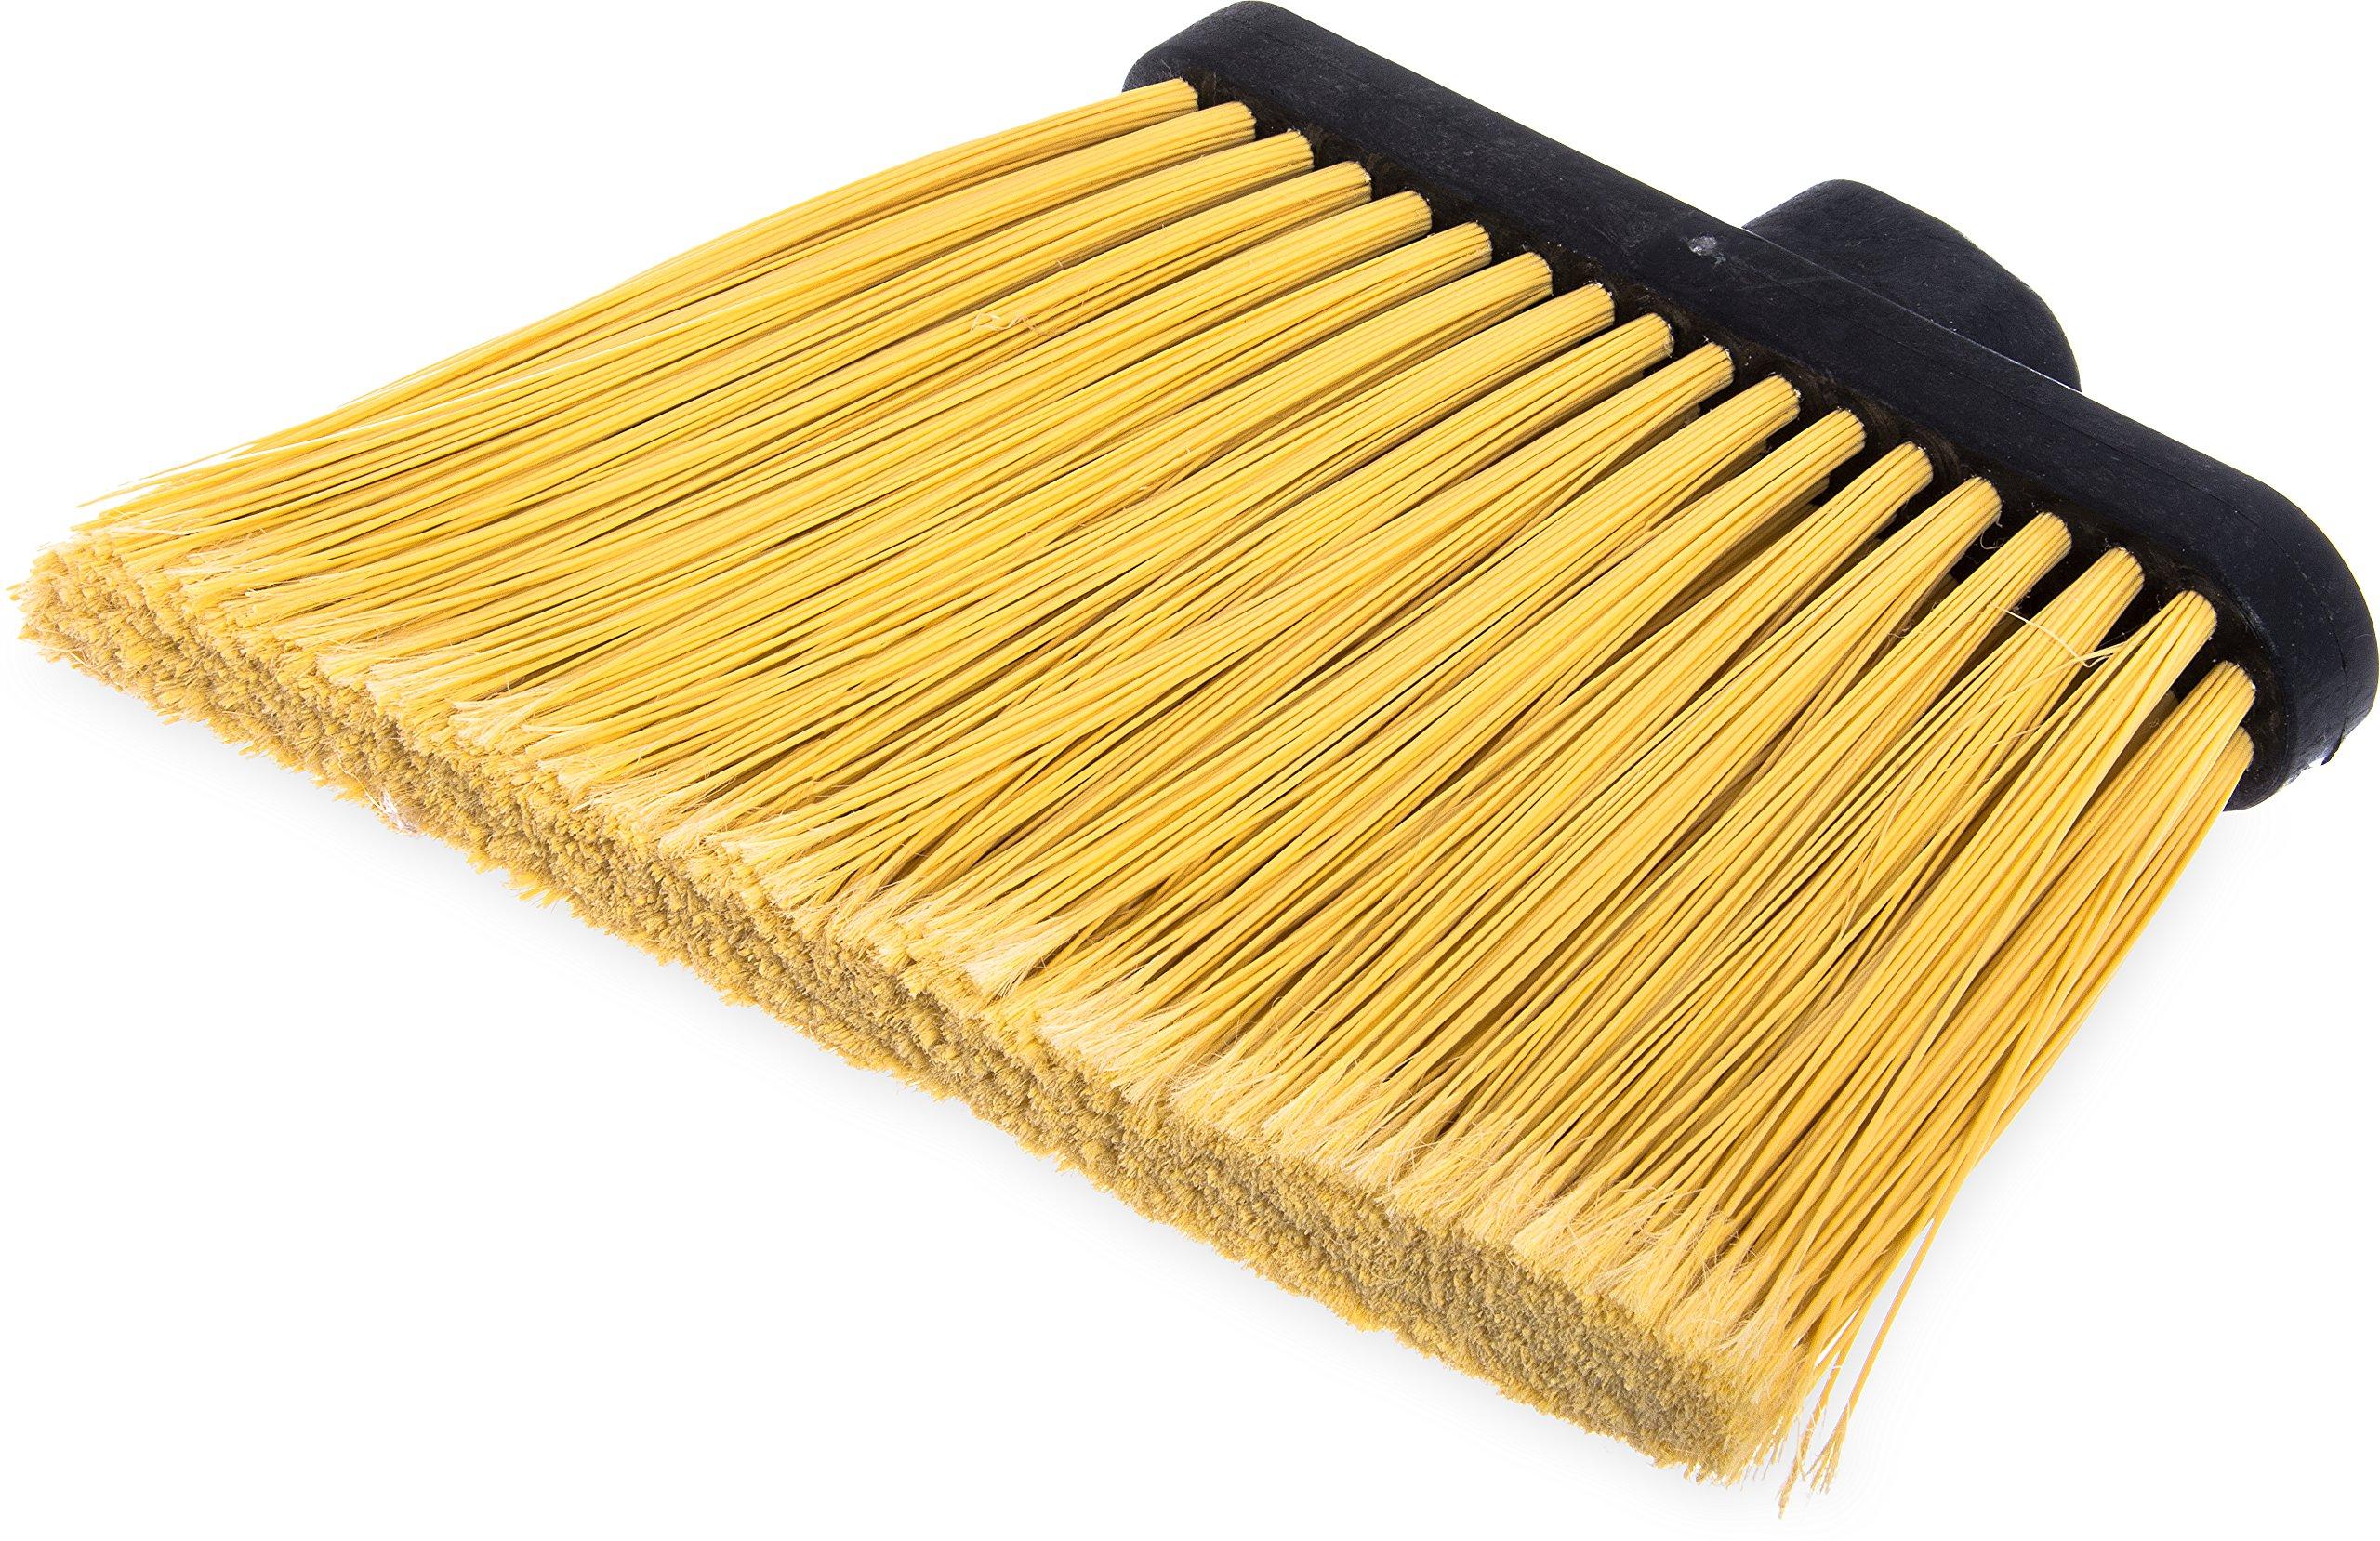 Carlisle 3686700 Duo-Sweep Flagged Angle Broom Head, 12'' Width, Natural